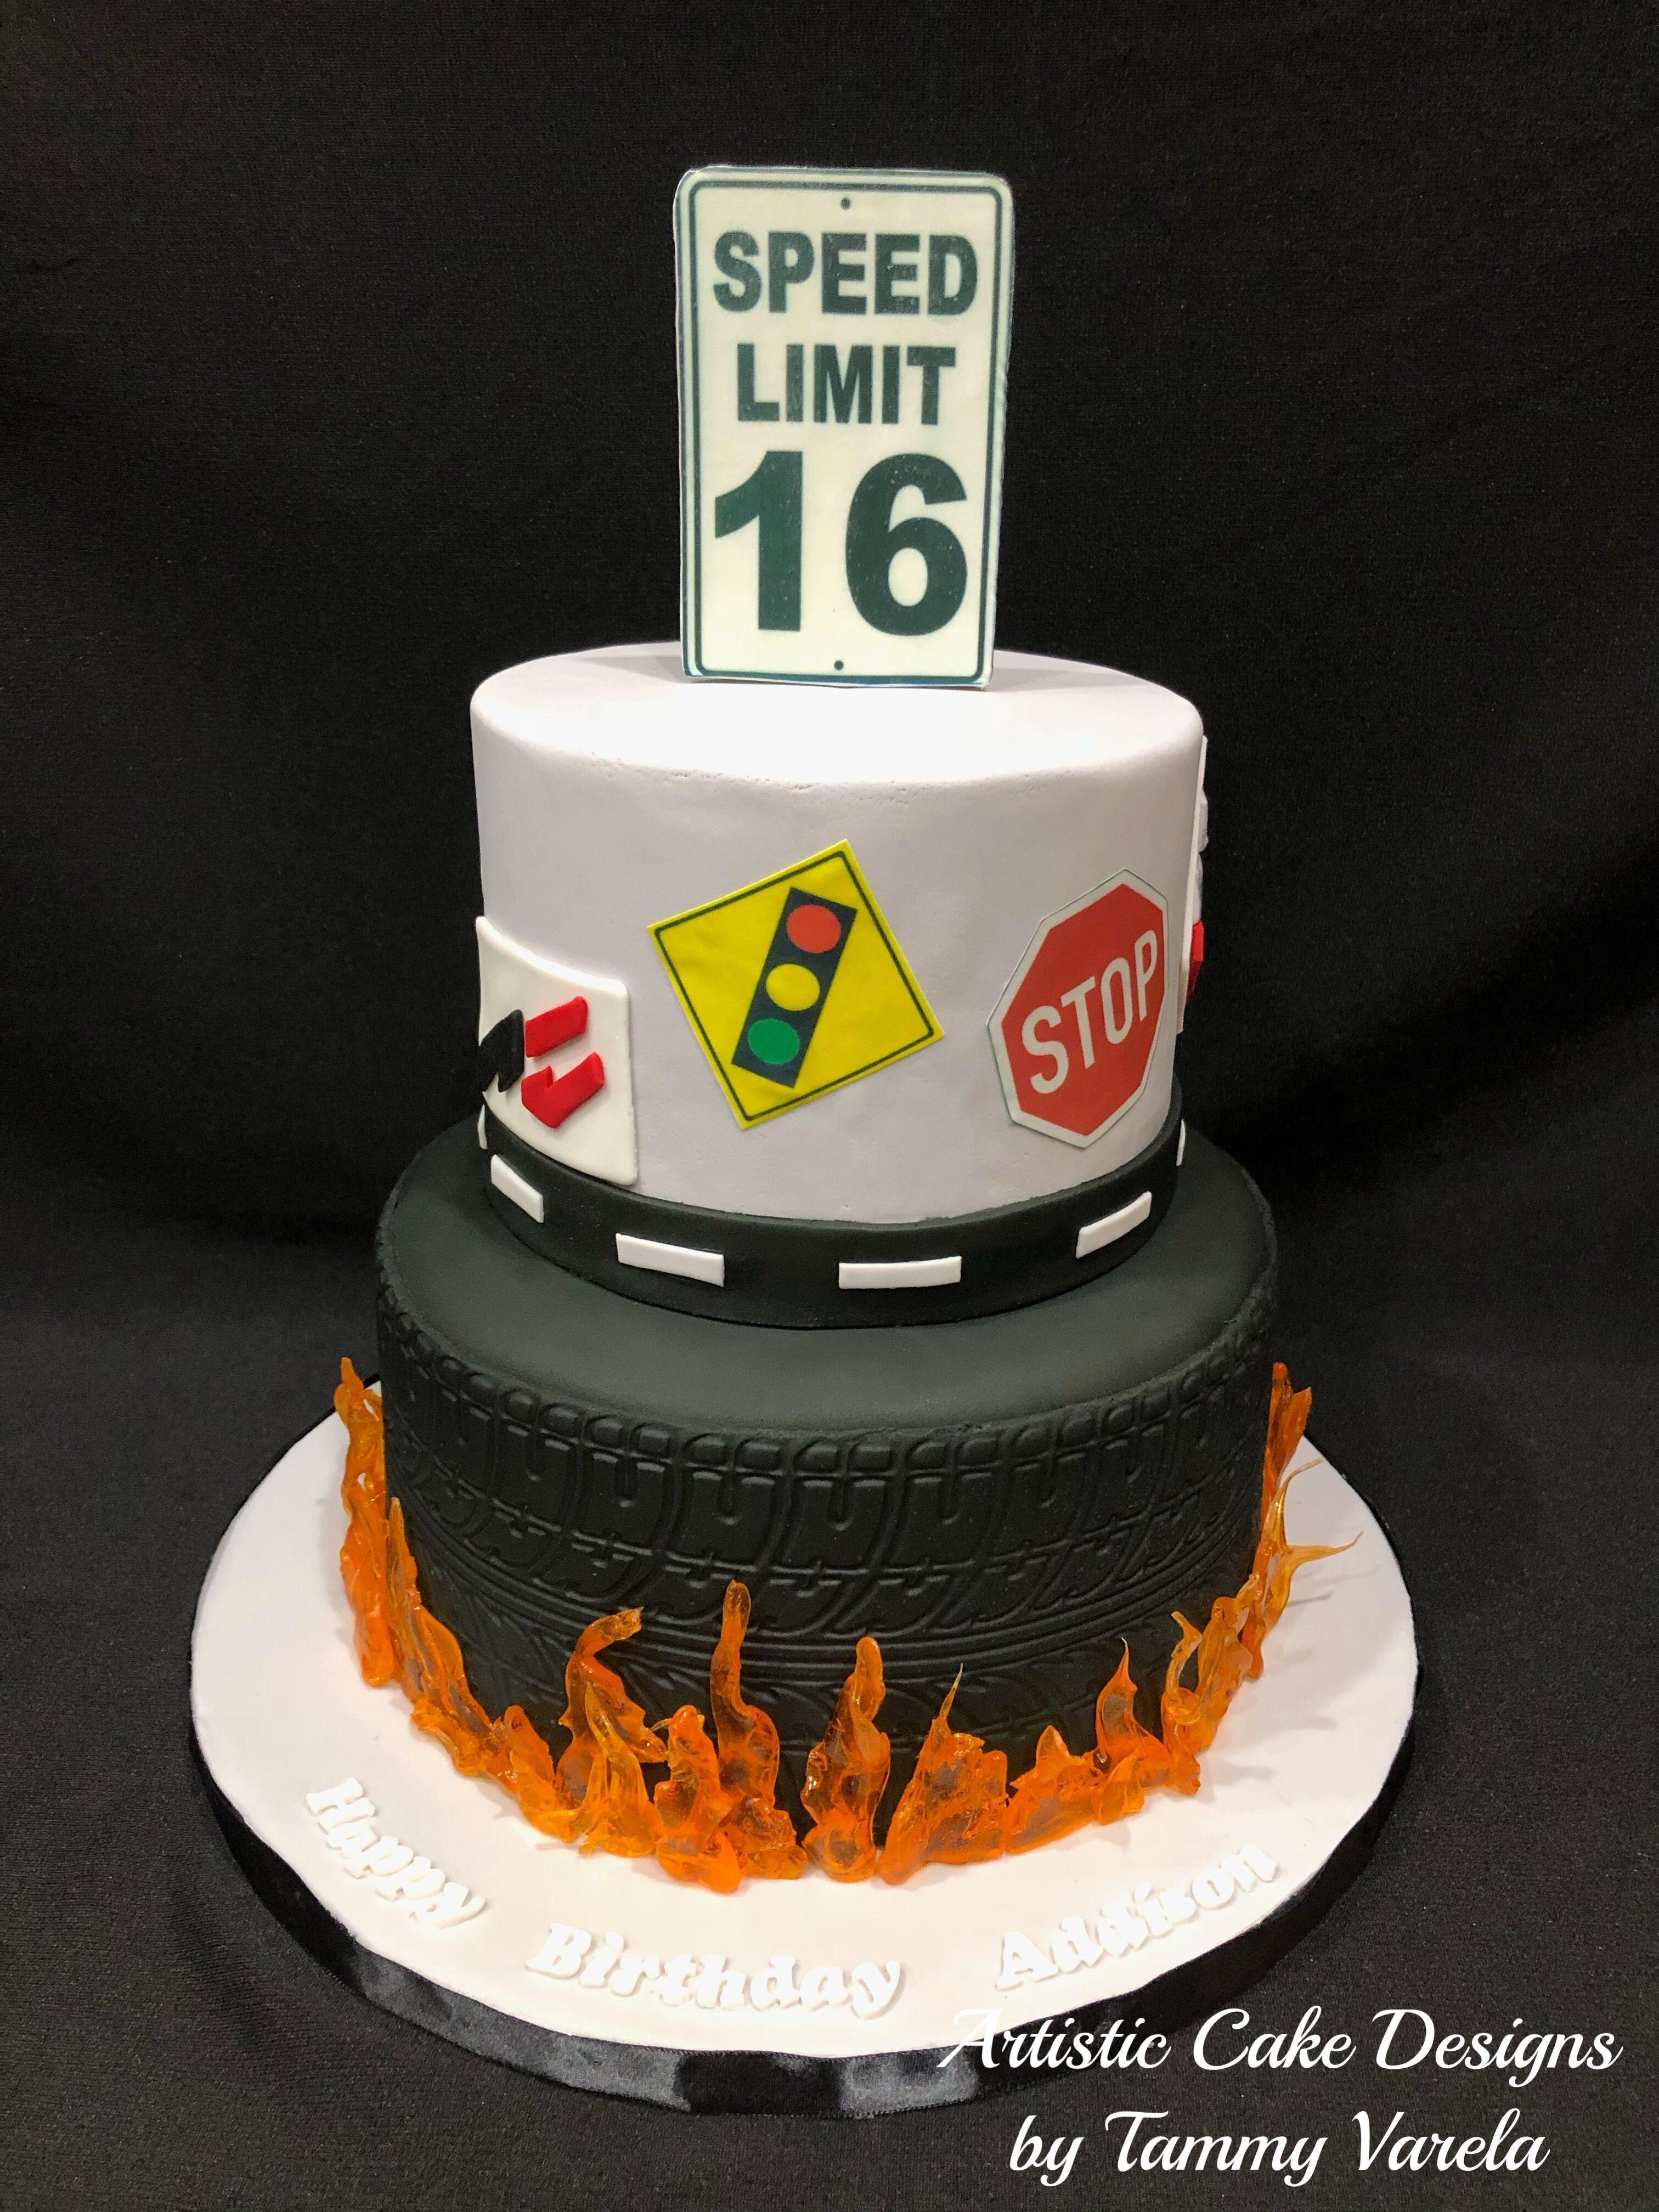 16 Yr Old Birthday Cake For Boy Tire And Sugar Flames Street